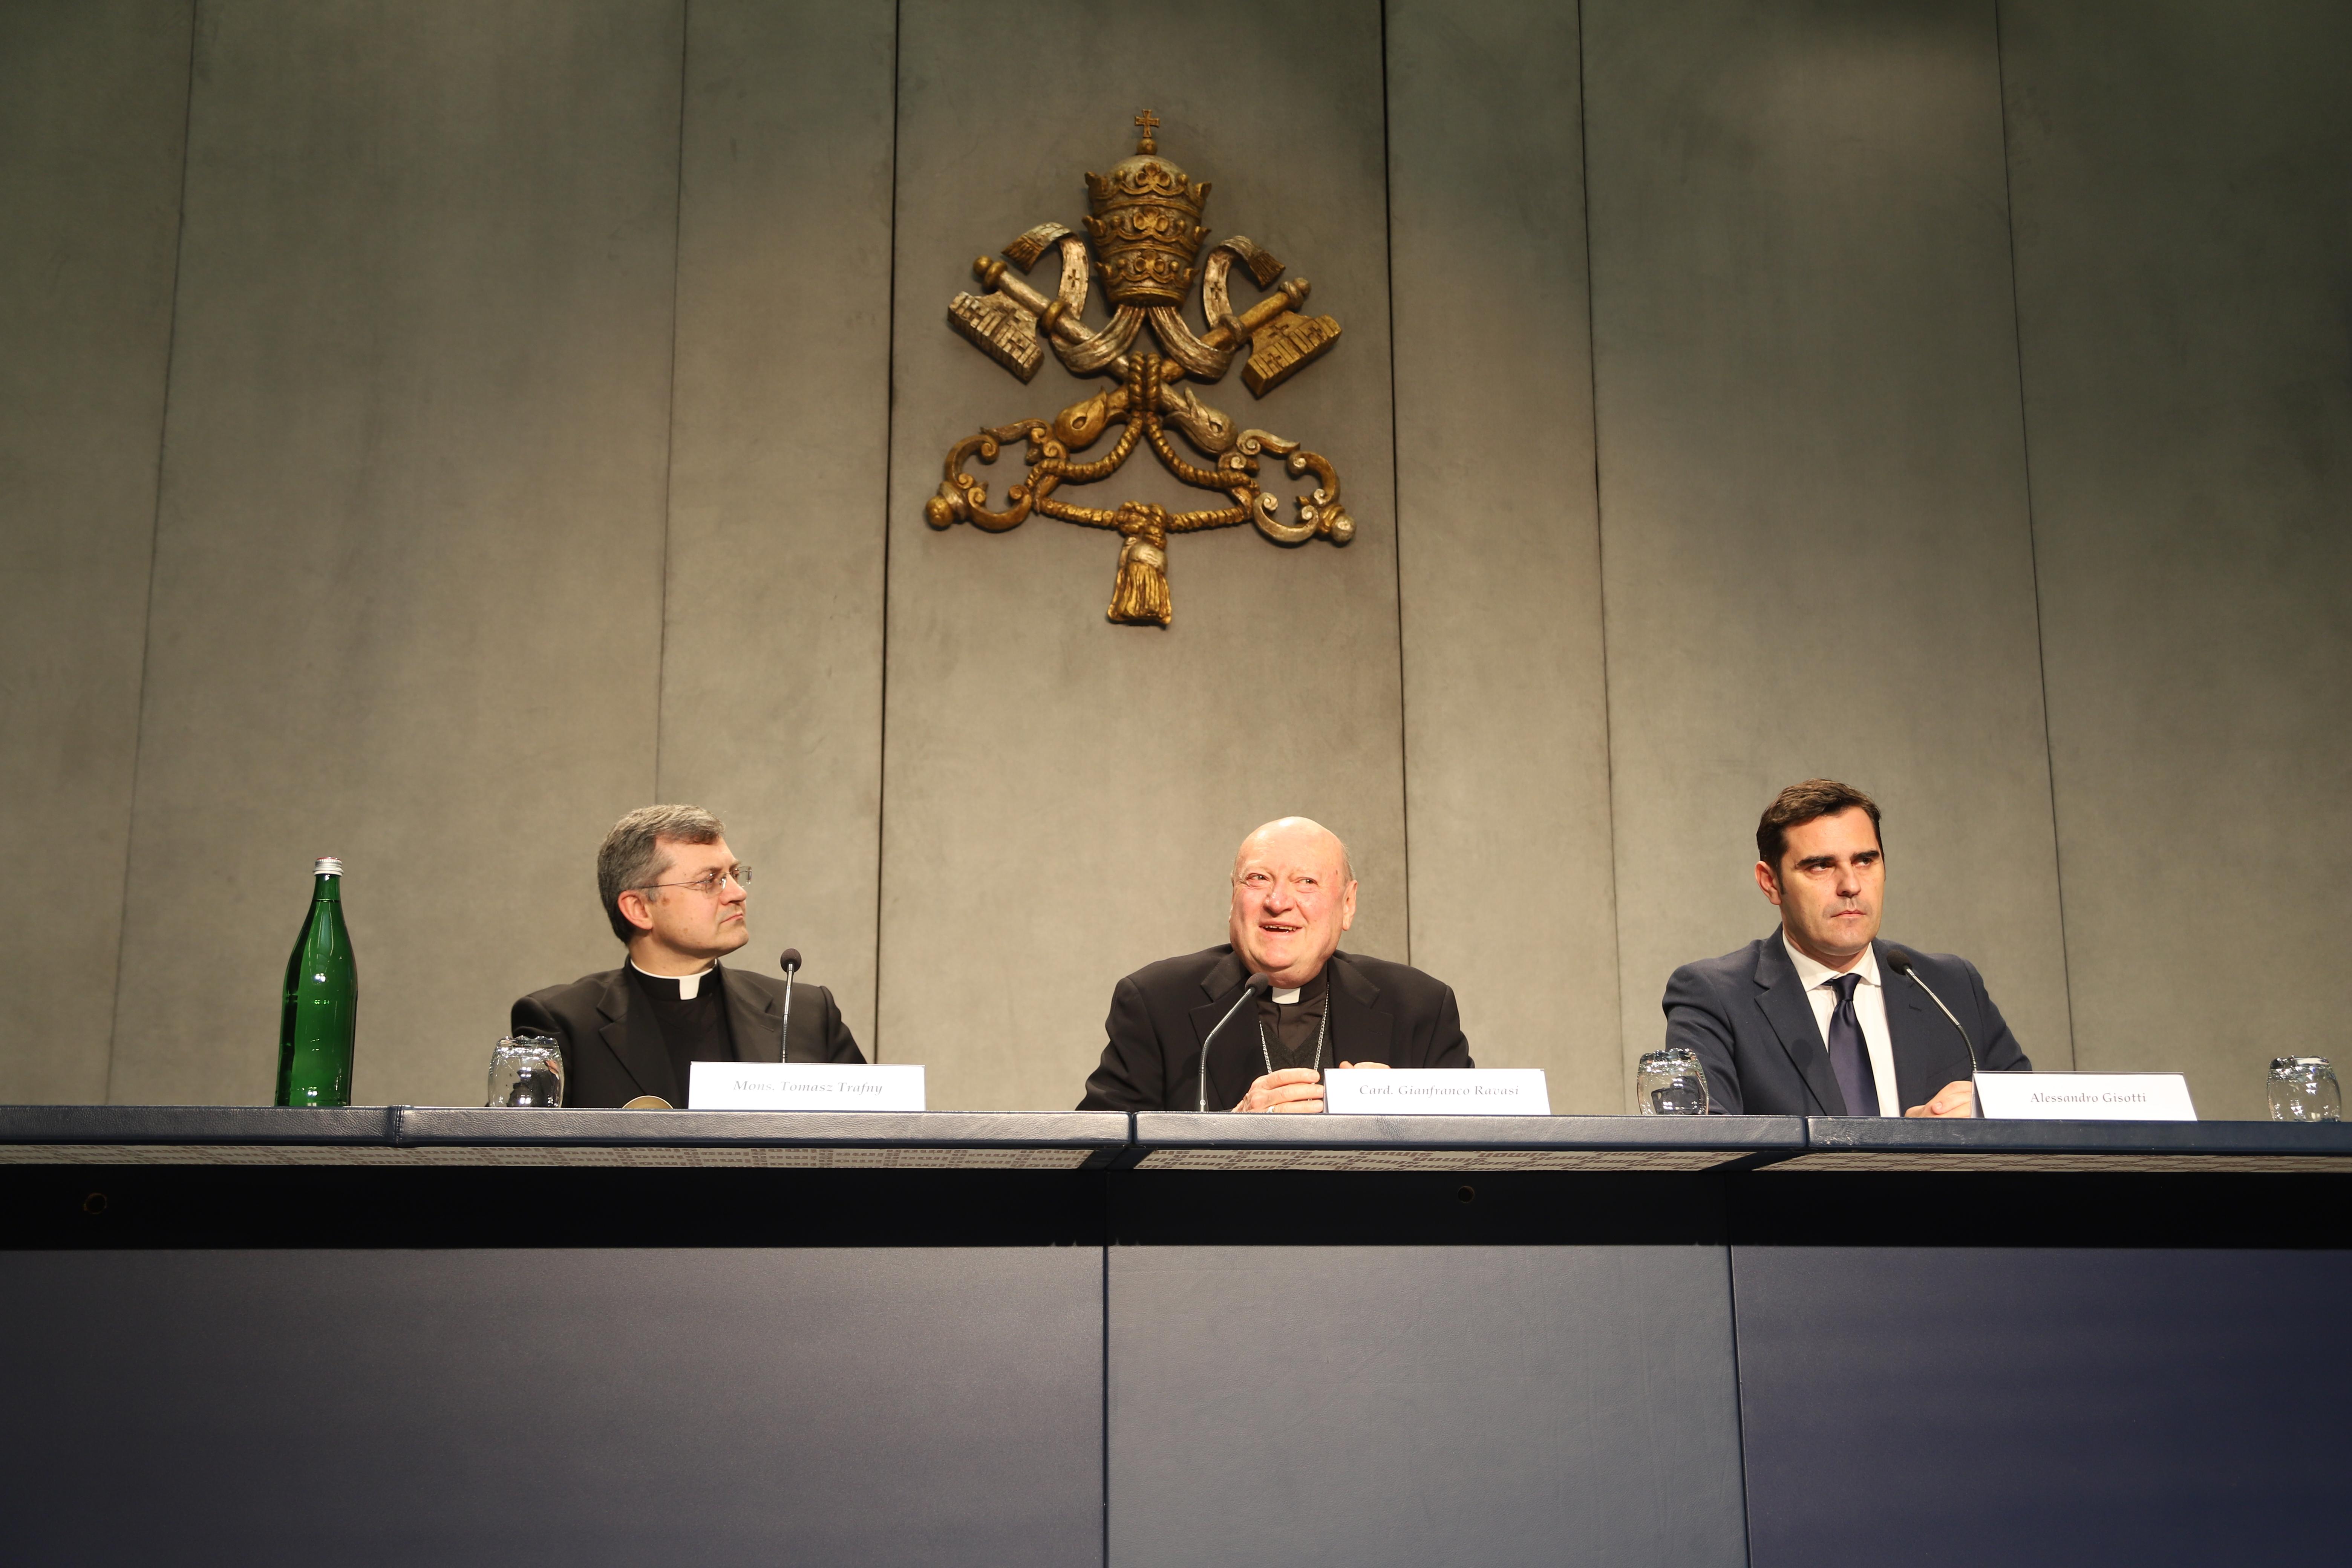 Rev. Trafny, Card. Ravasi y Alessandro Gisotti © Zenit/María Langarica